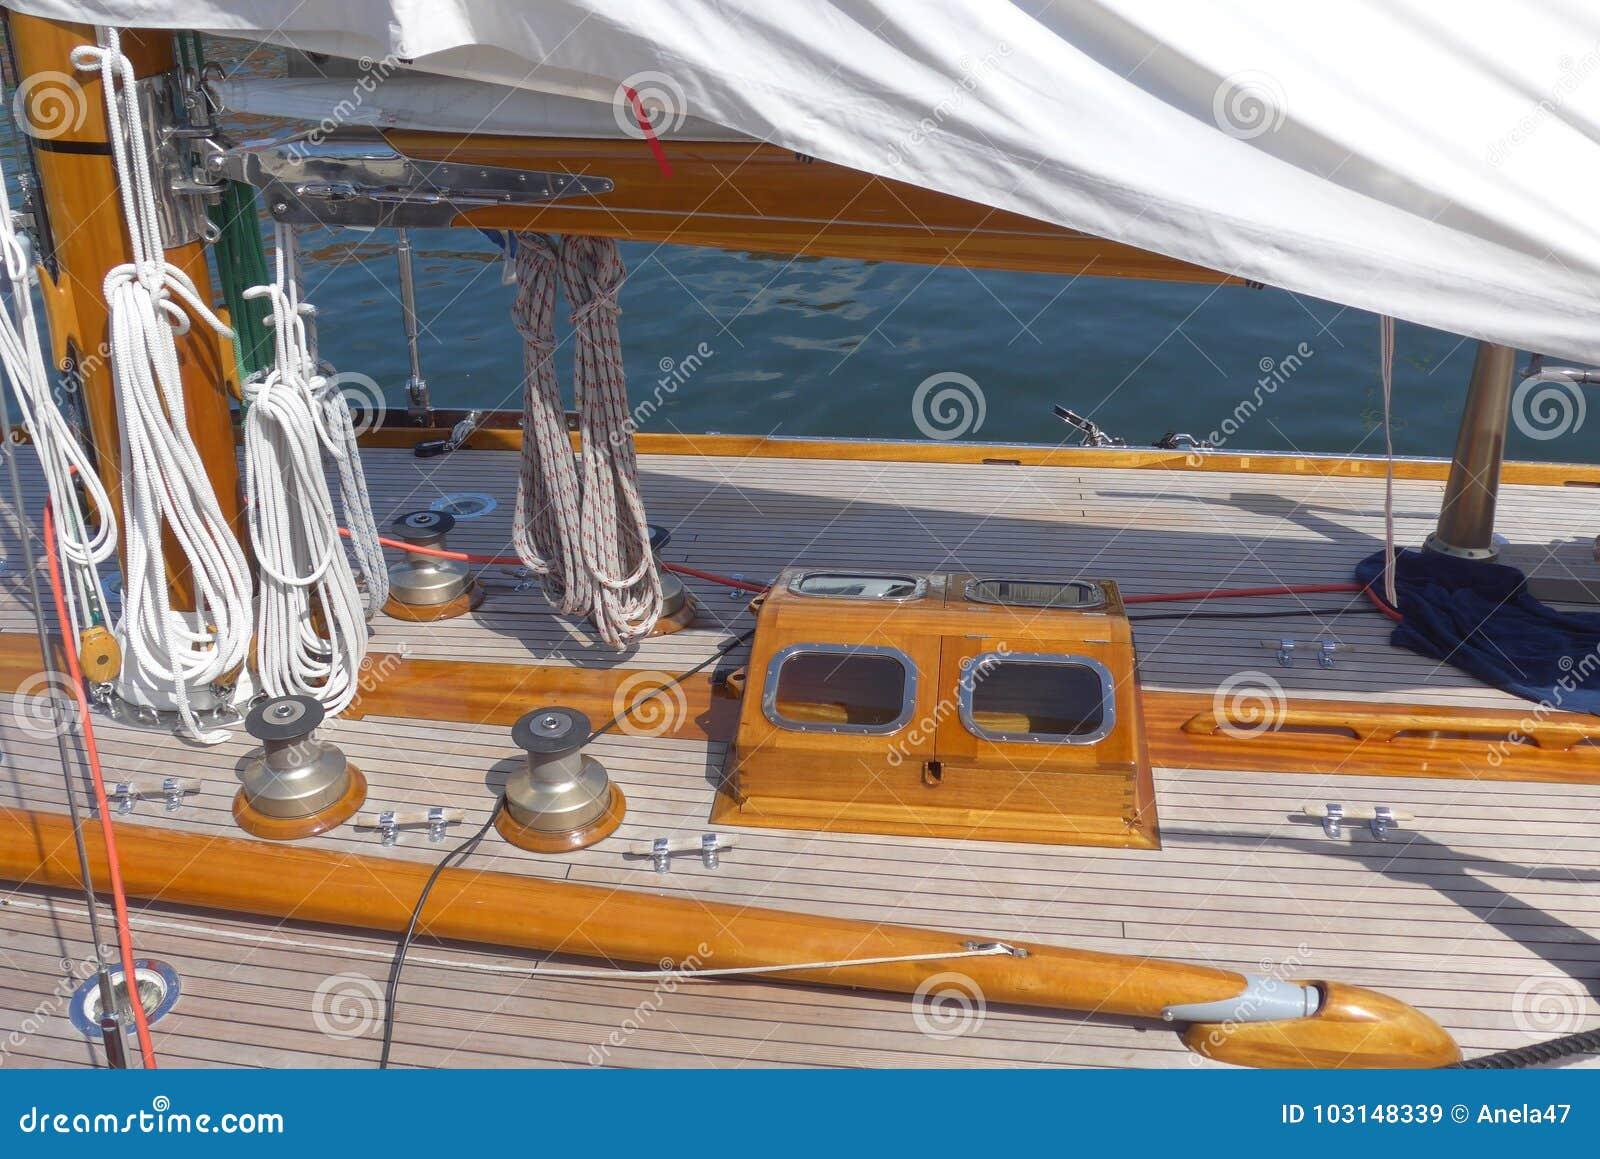 Detail photos of a sailing yacht, teak deck